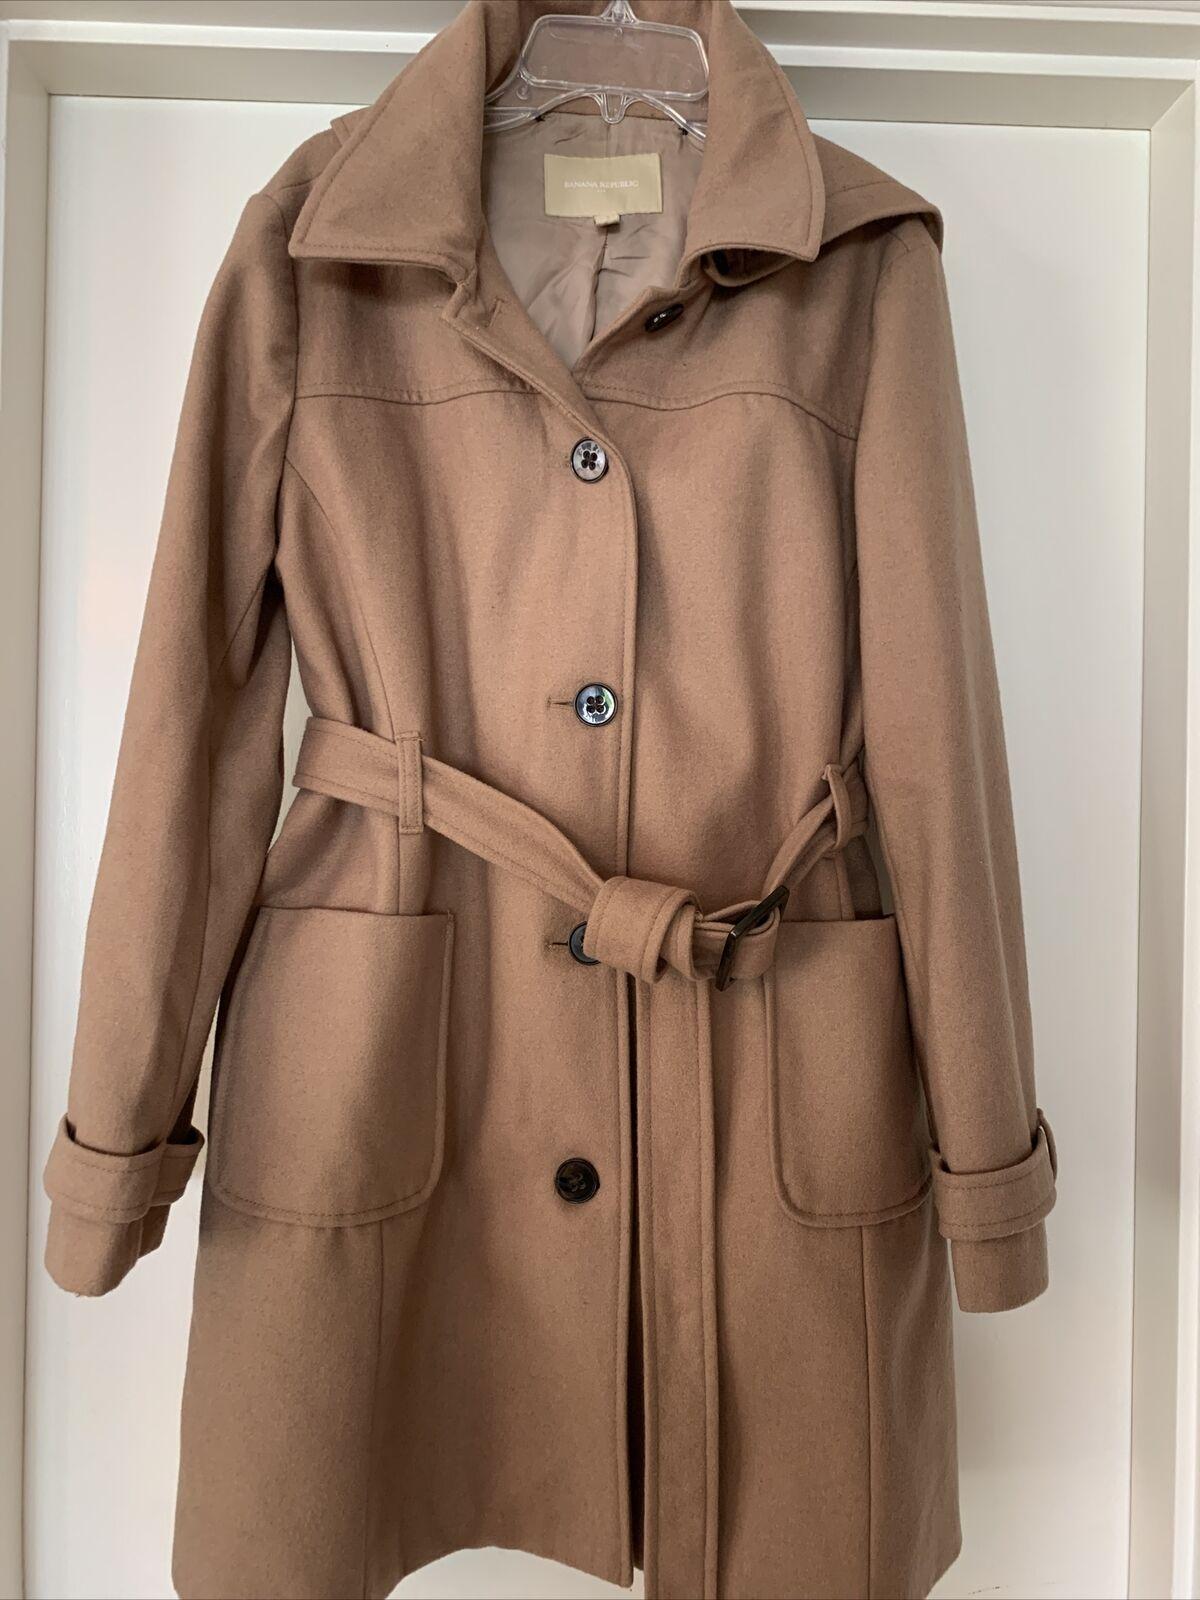 Banana Repulblic Wool Jacket Belted Hooded Coat Camel Tan Color-Petite L LP